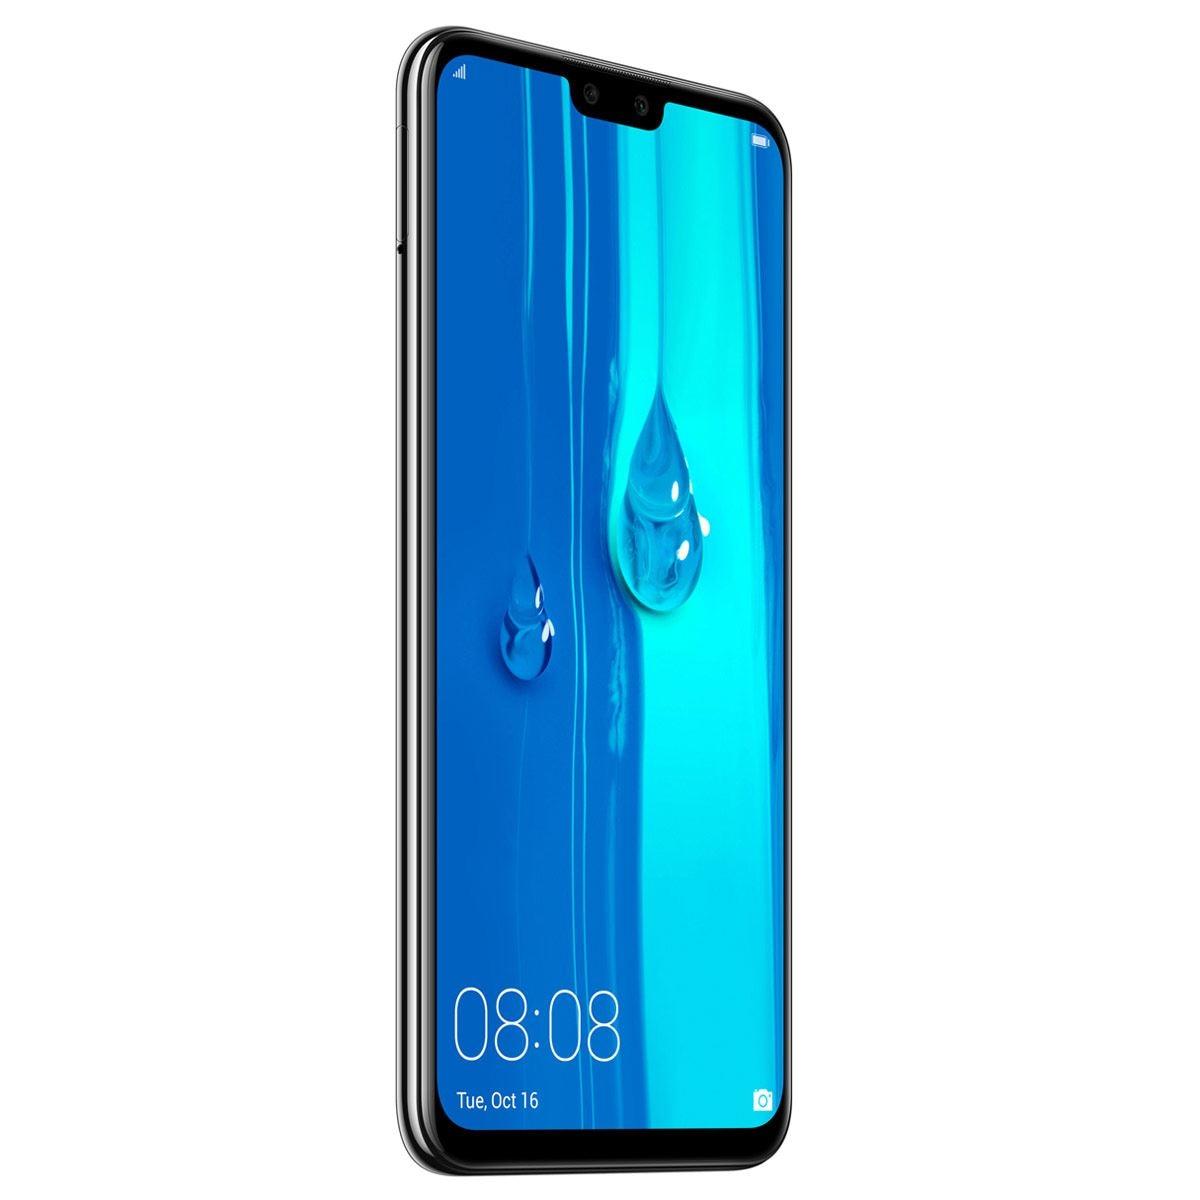 Celular Huawei JKM-LX3 Y9 2019 Color Negro R9 (Telcel)